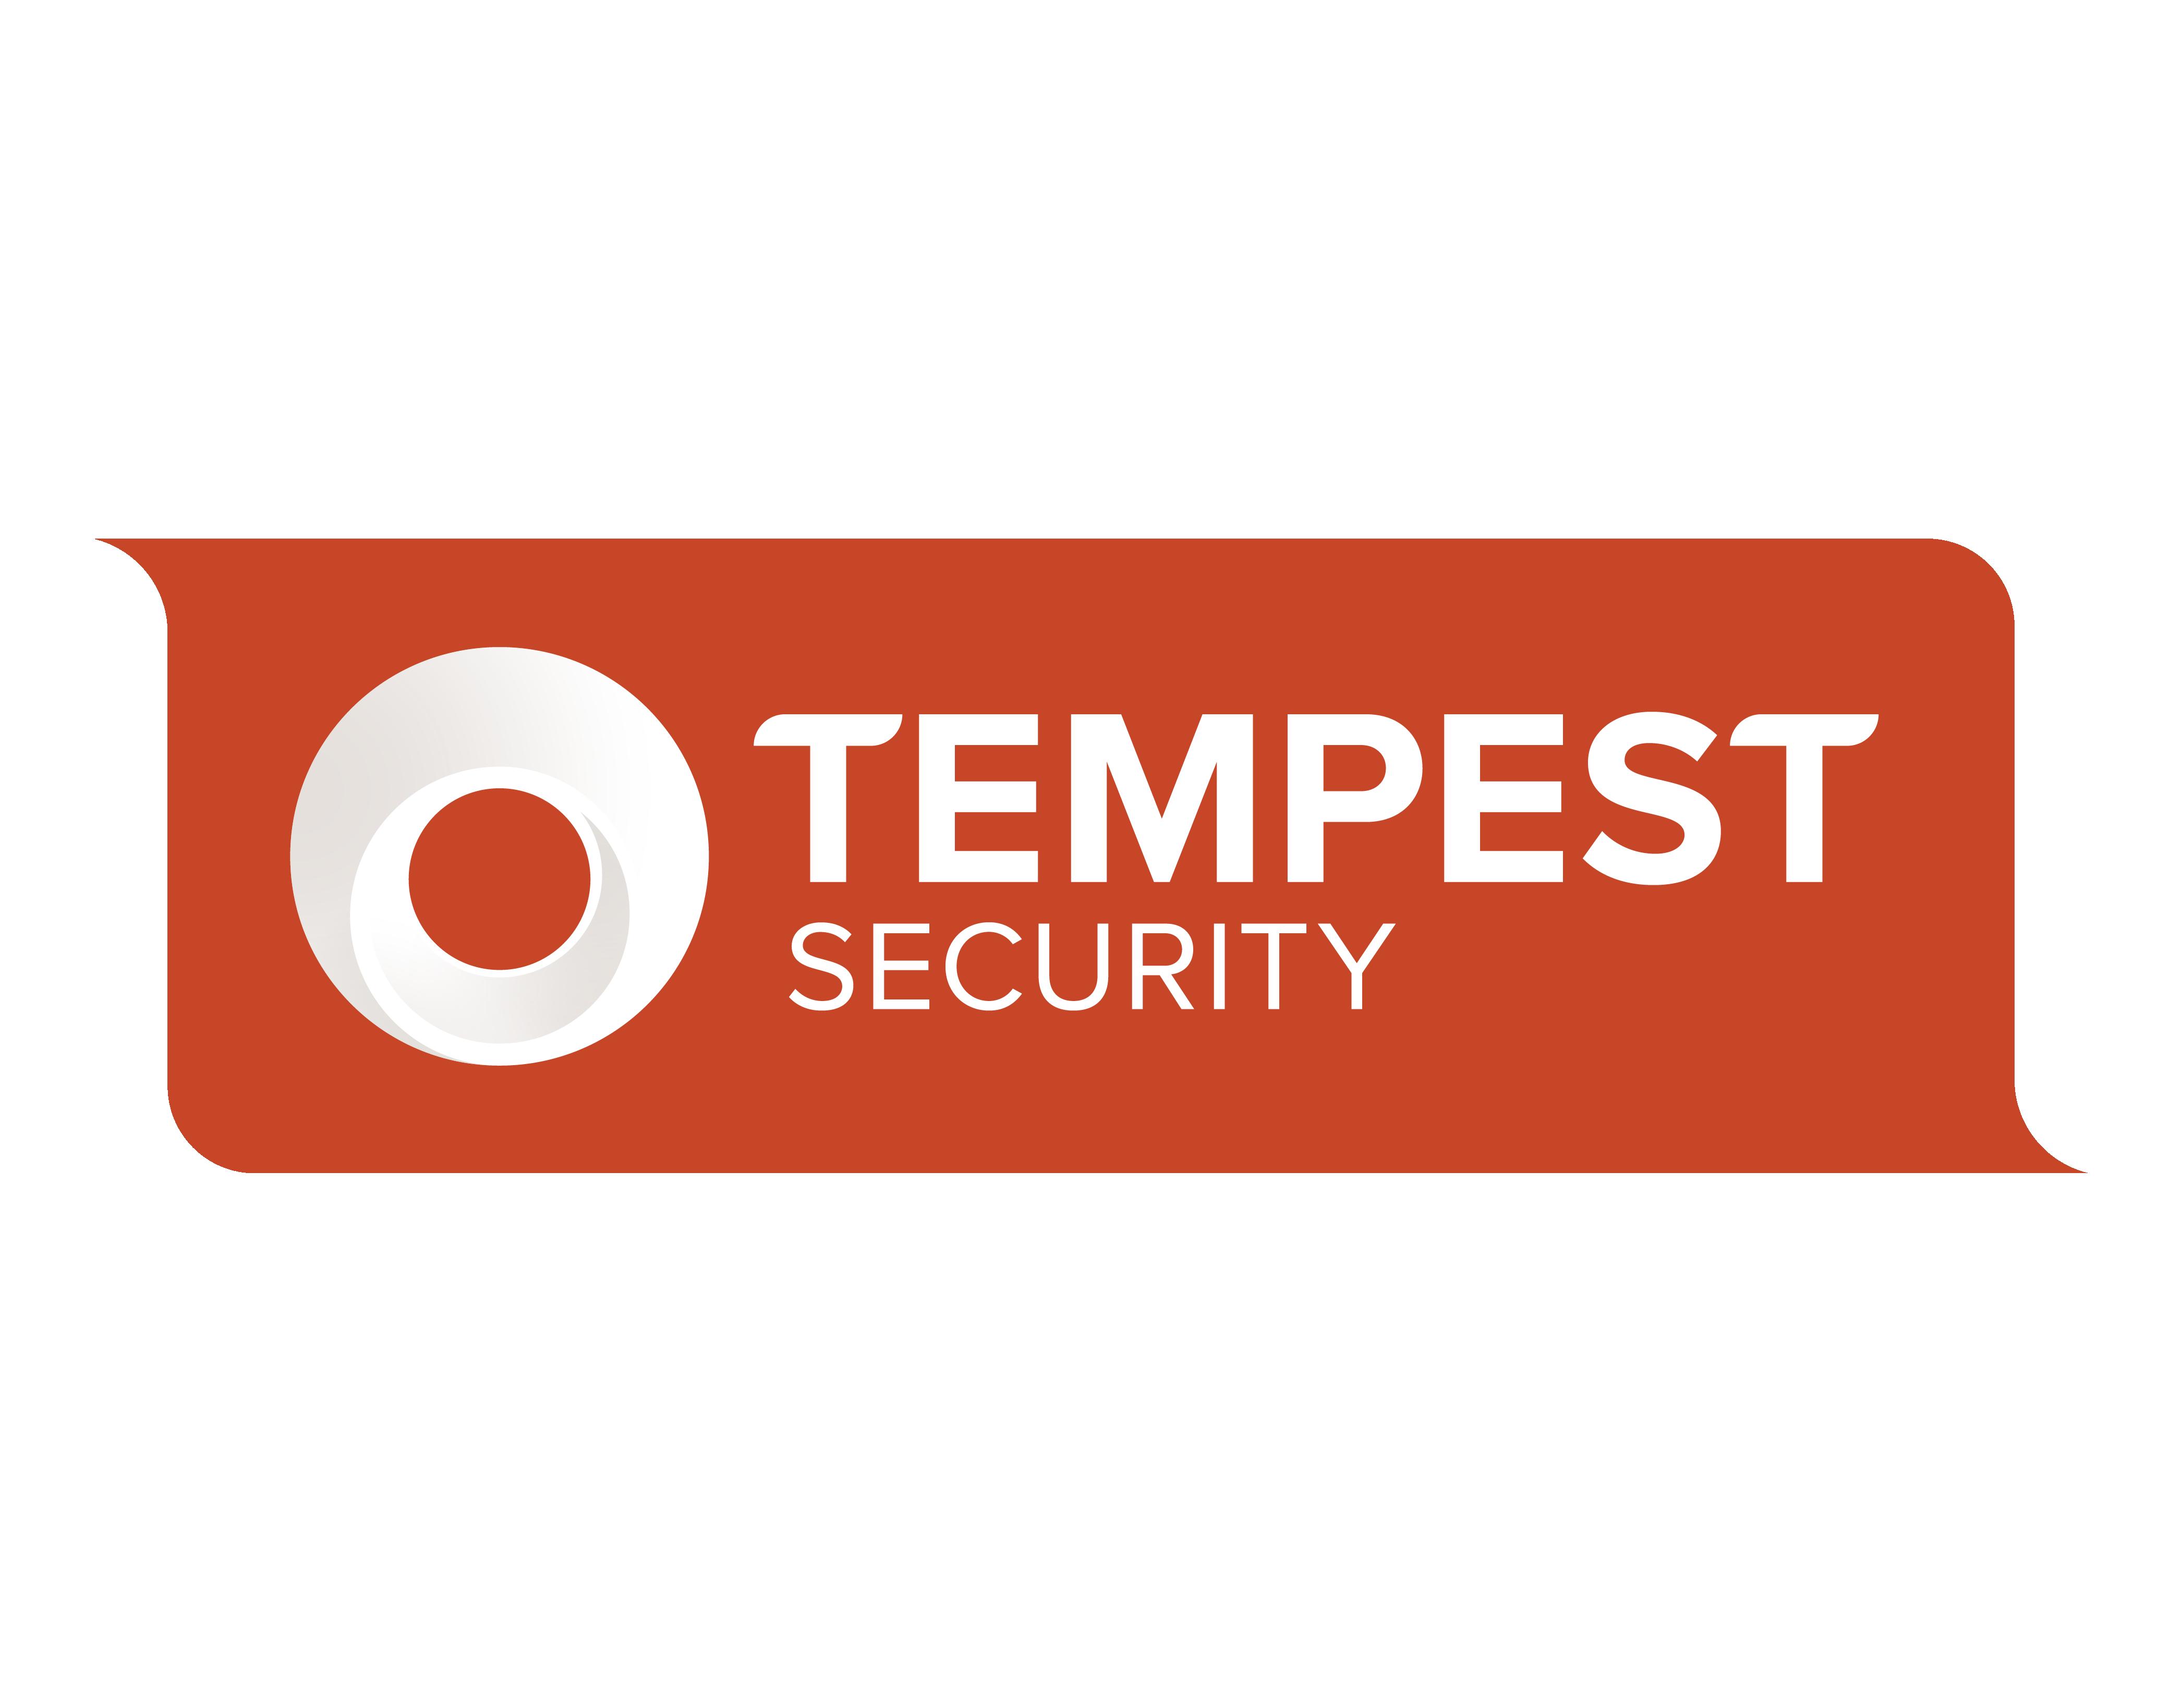 Tempest-logotyp_Liggande-i-form_RGB3